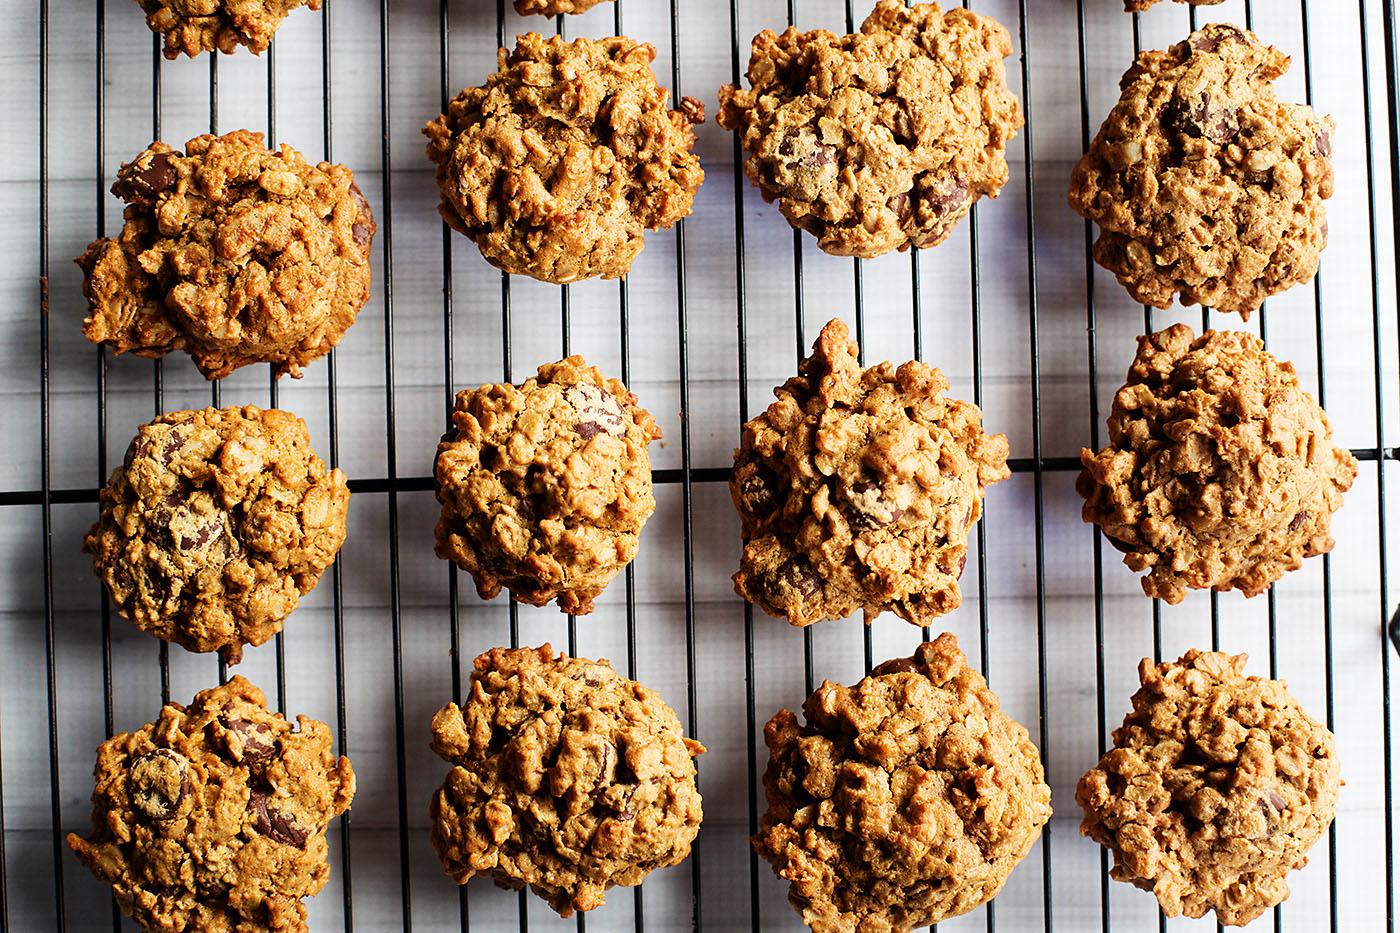 Flourless Gluten Free Oatmeal Chocolate Chip Cookies